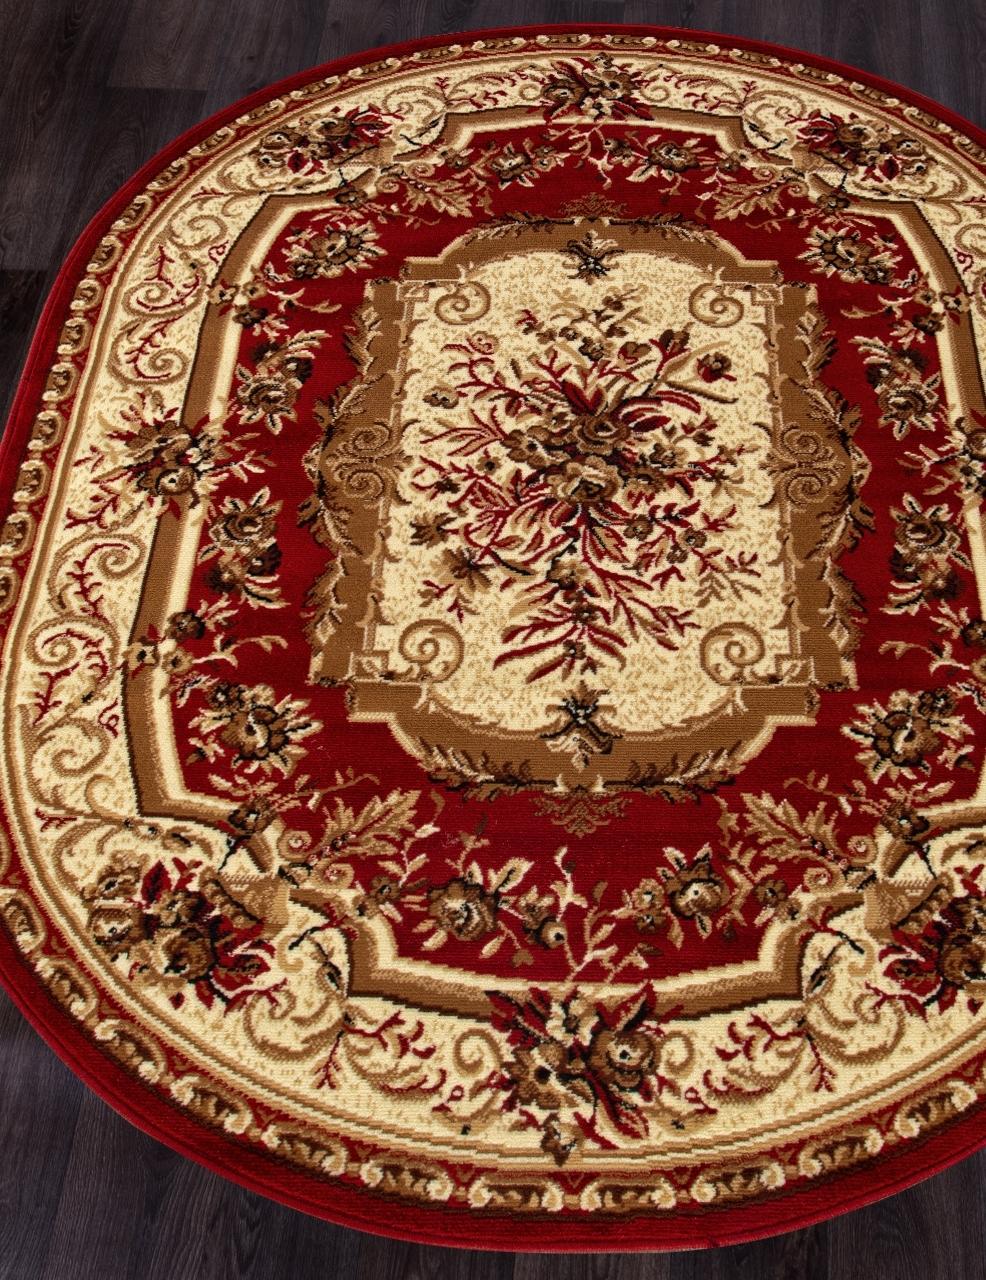 Ковер 5439 - RED - Овал - коллекция LAGUNA - фото 1